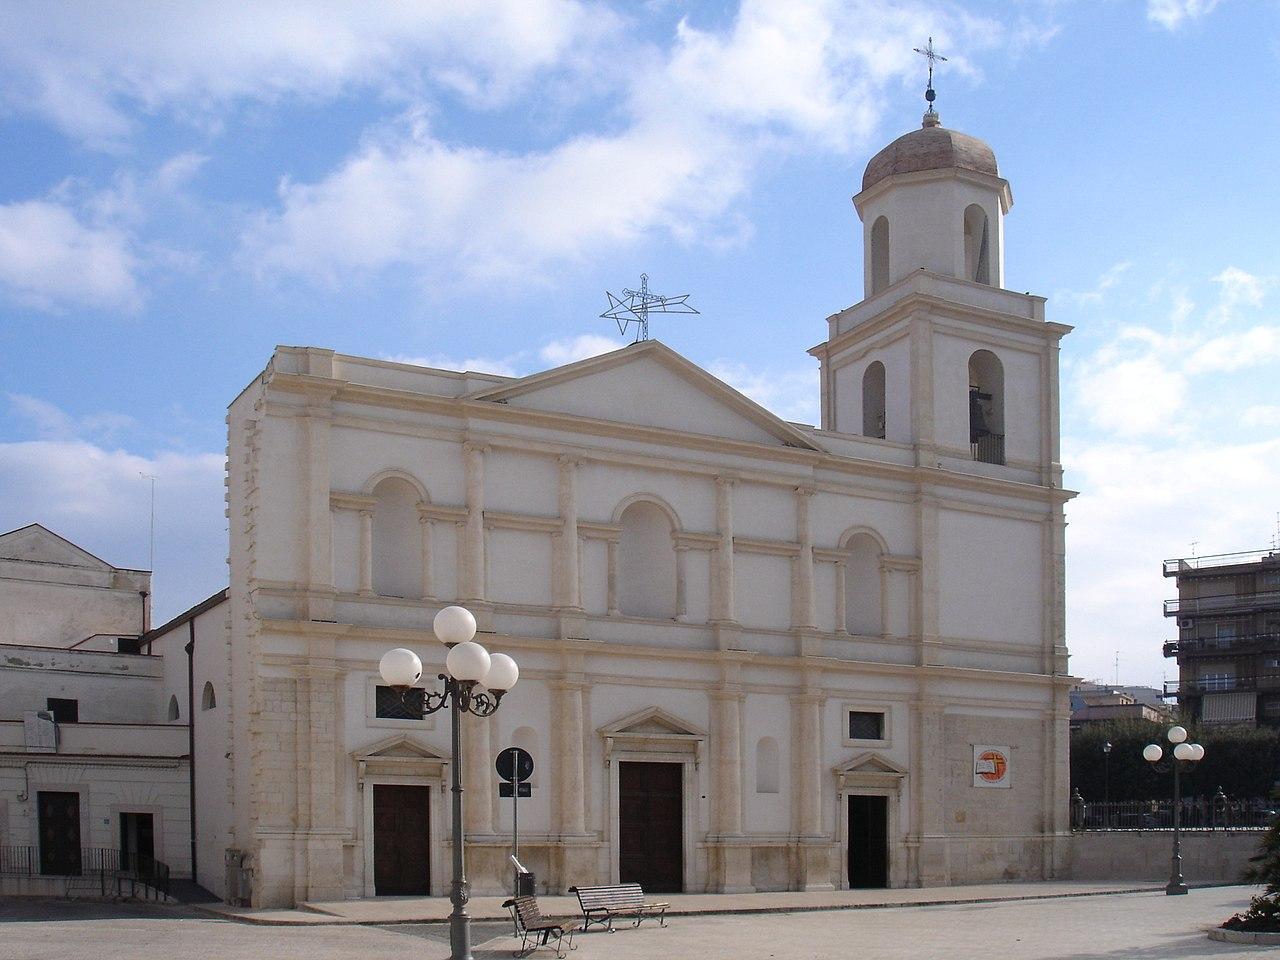 Canosa Cattedrale2.JPG